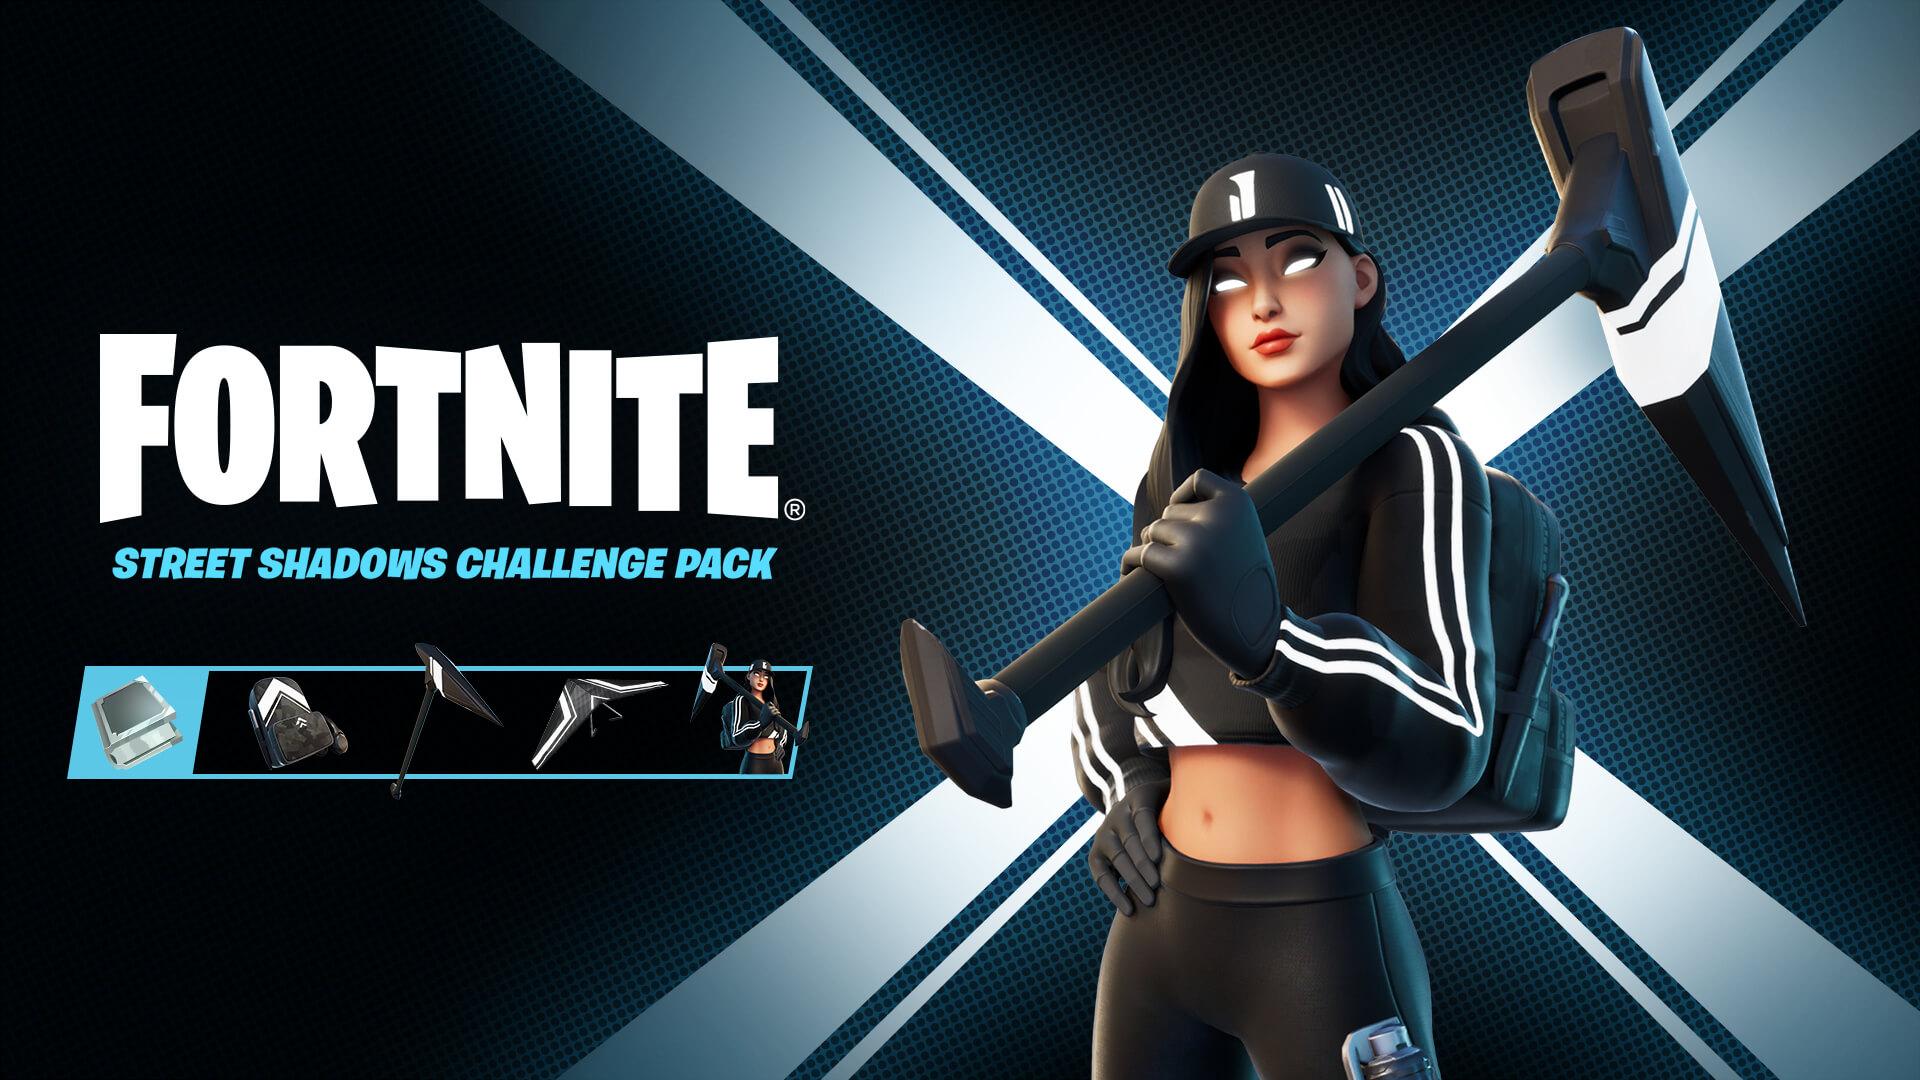 Fortnite Street Shadows Challenge Pack